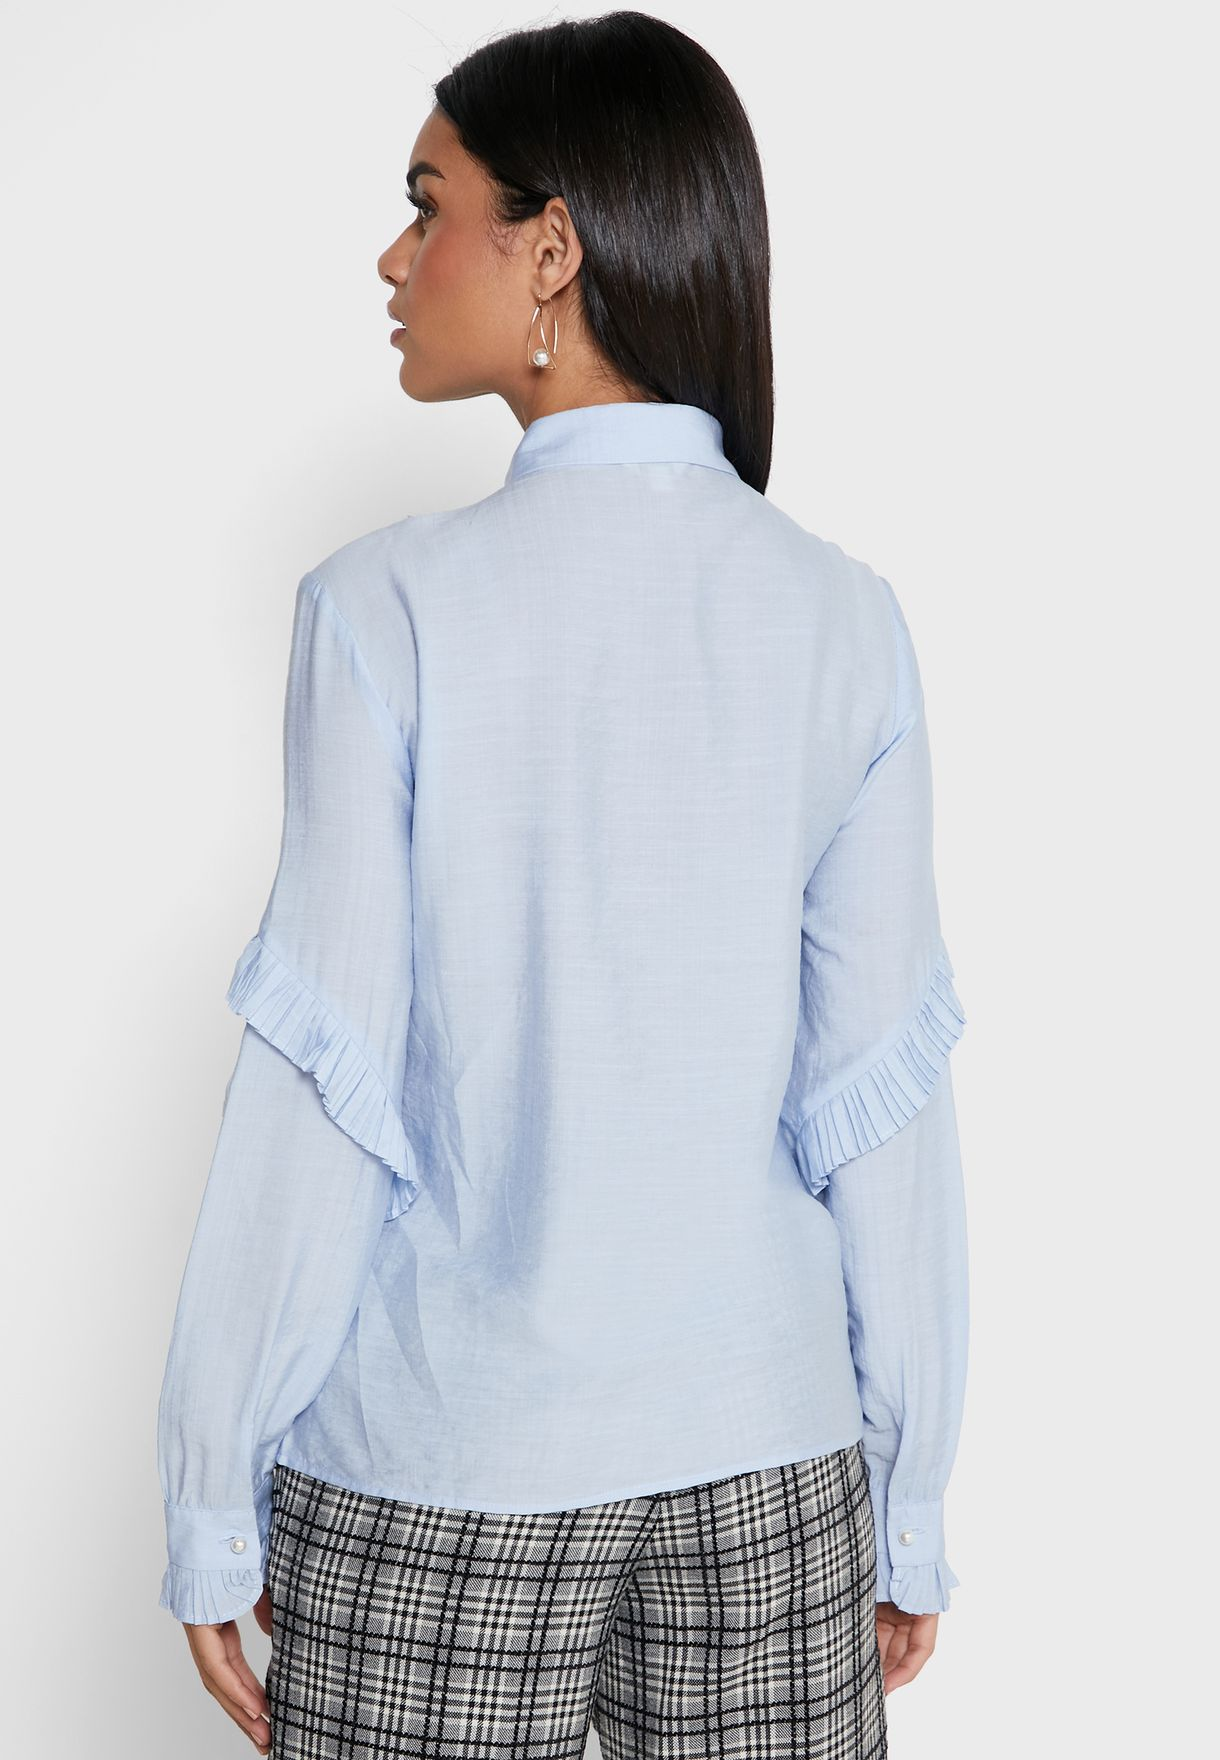 قميص مزين ببروش